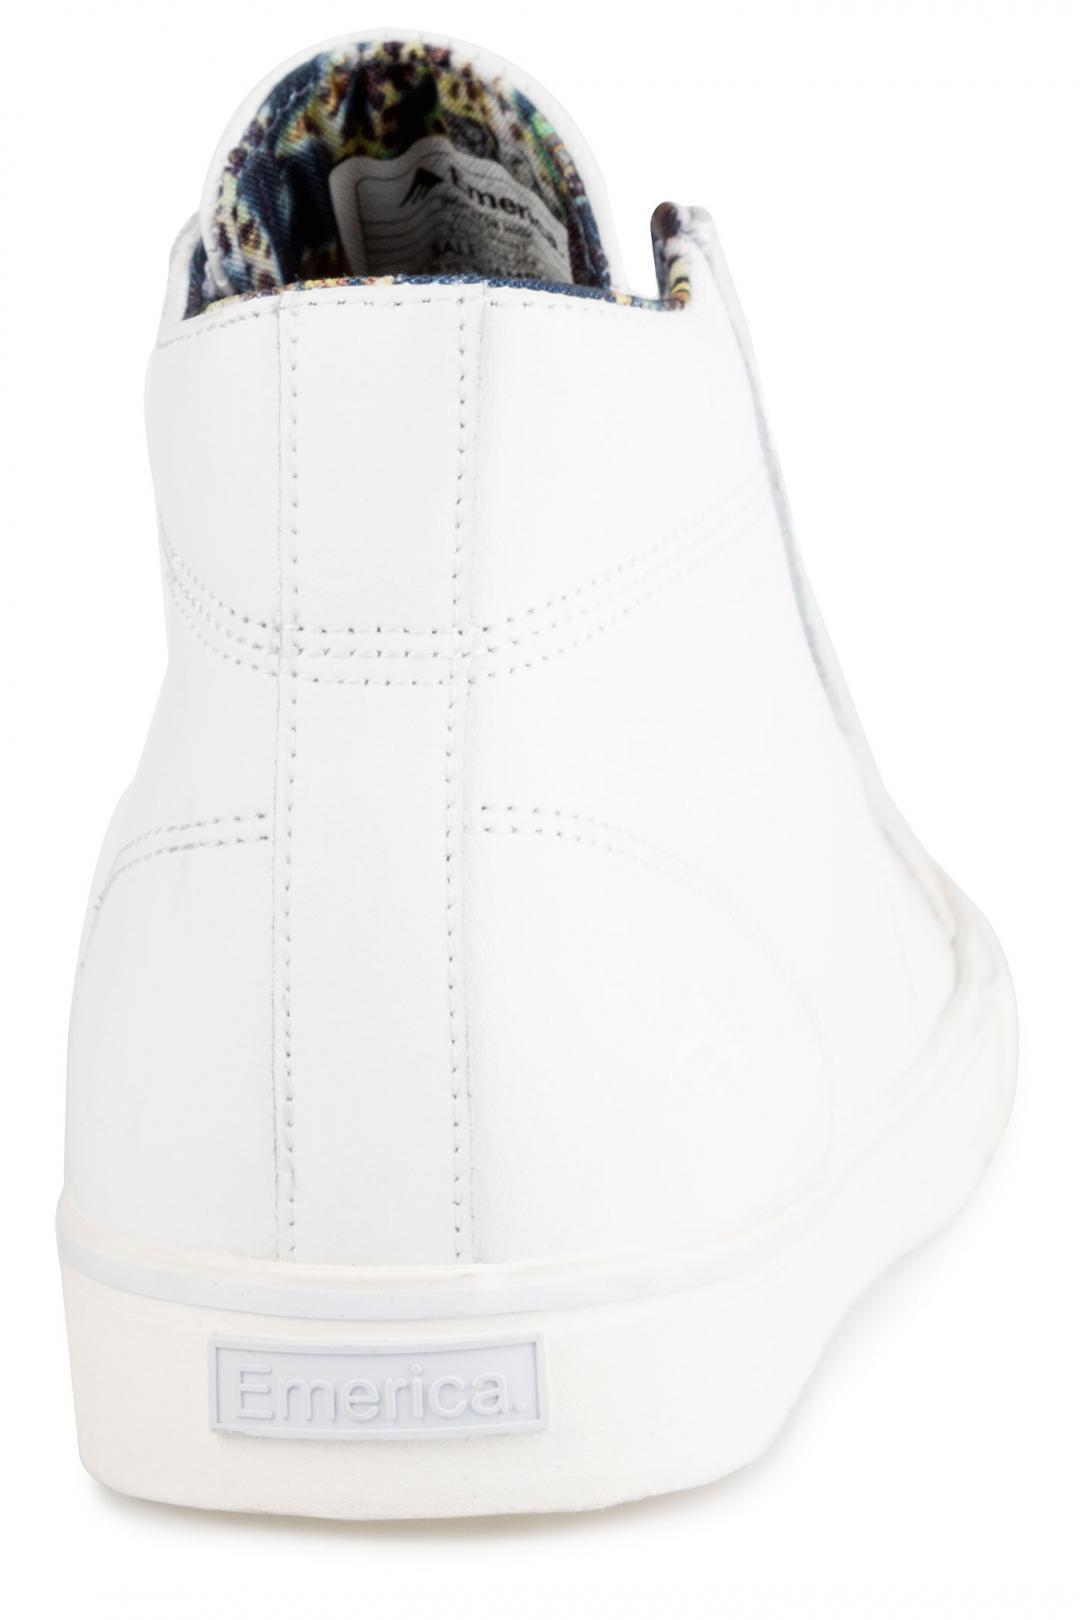 Uomo Emerica Indicator High white print | Scarpe da skate